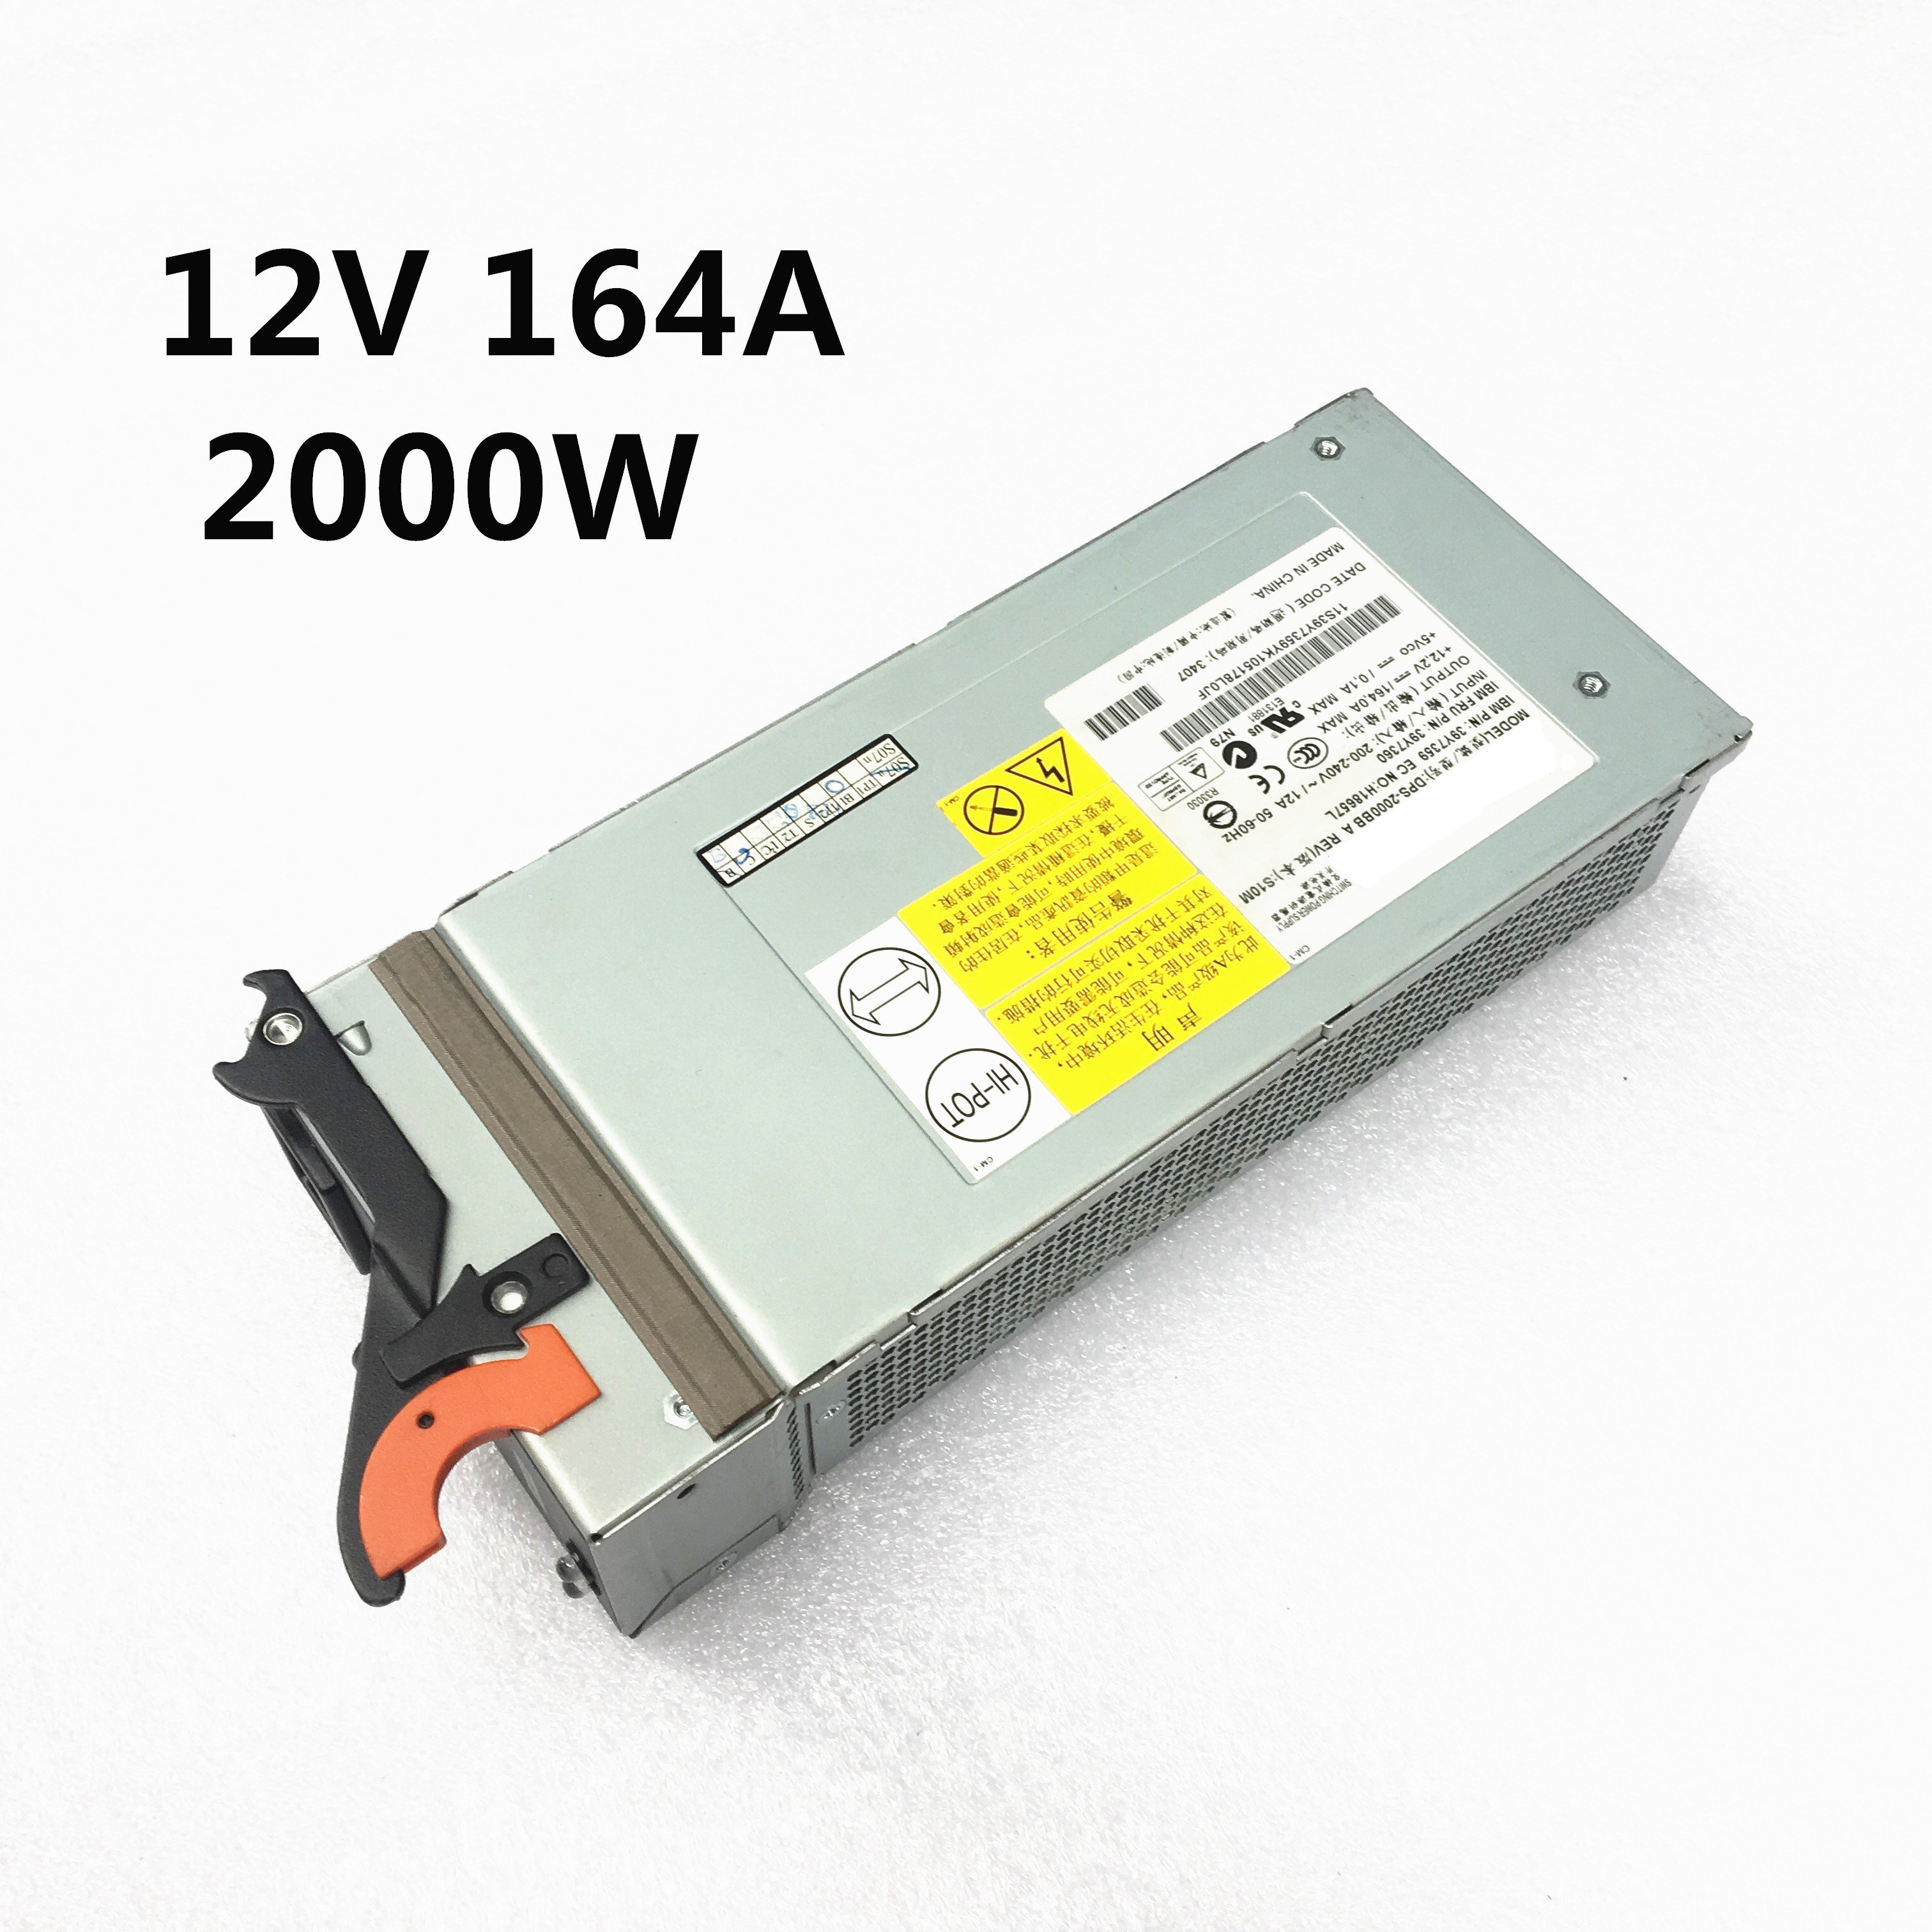 100 Strict test DPS 2000BB A Server power 39Y7359 39Y7360 74p4452 74p4453 12V 164A 2000W Switching